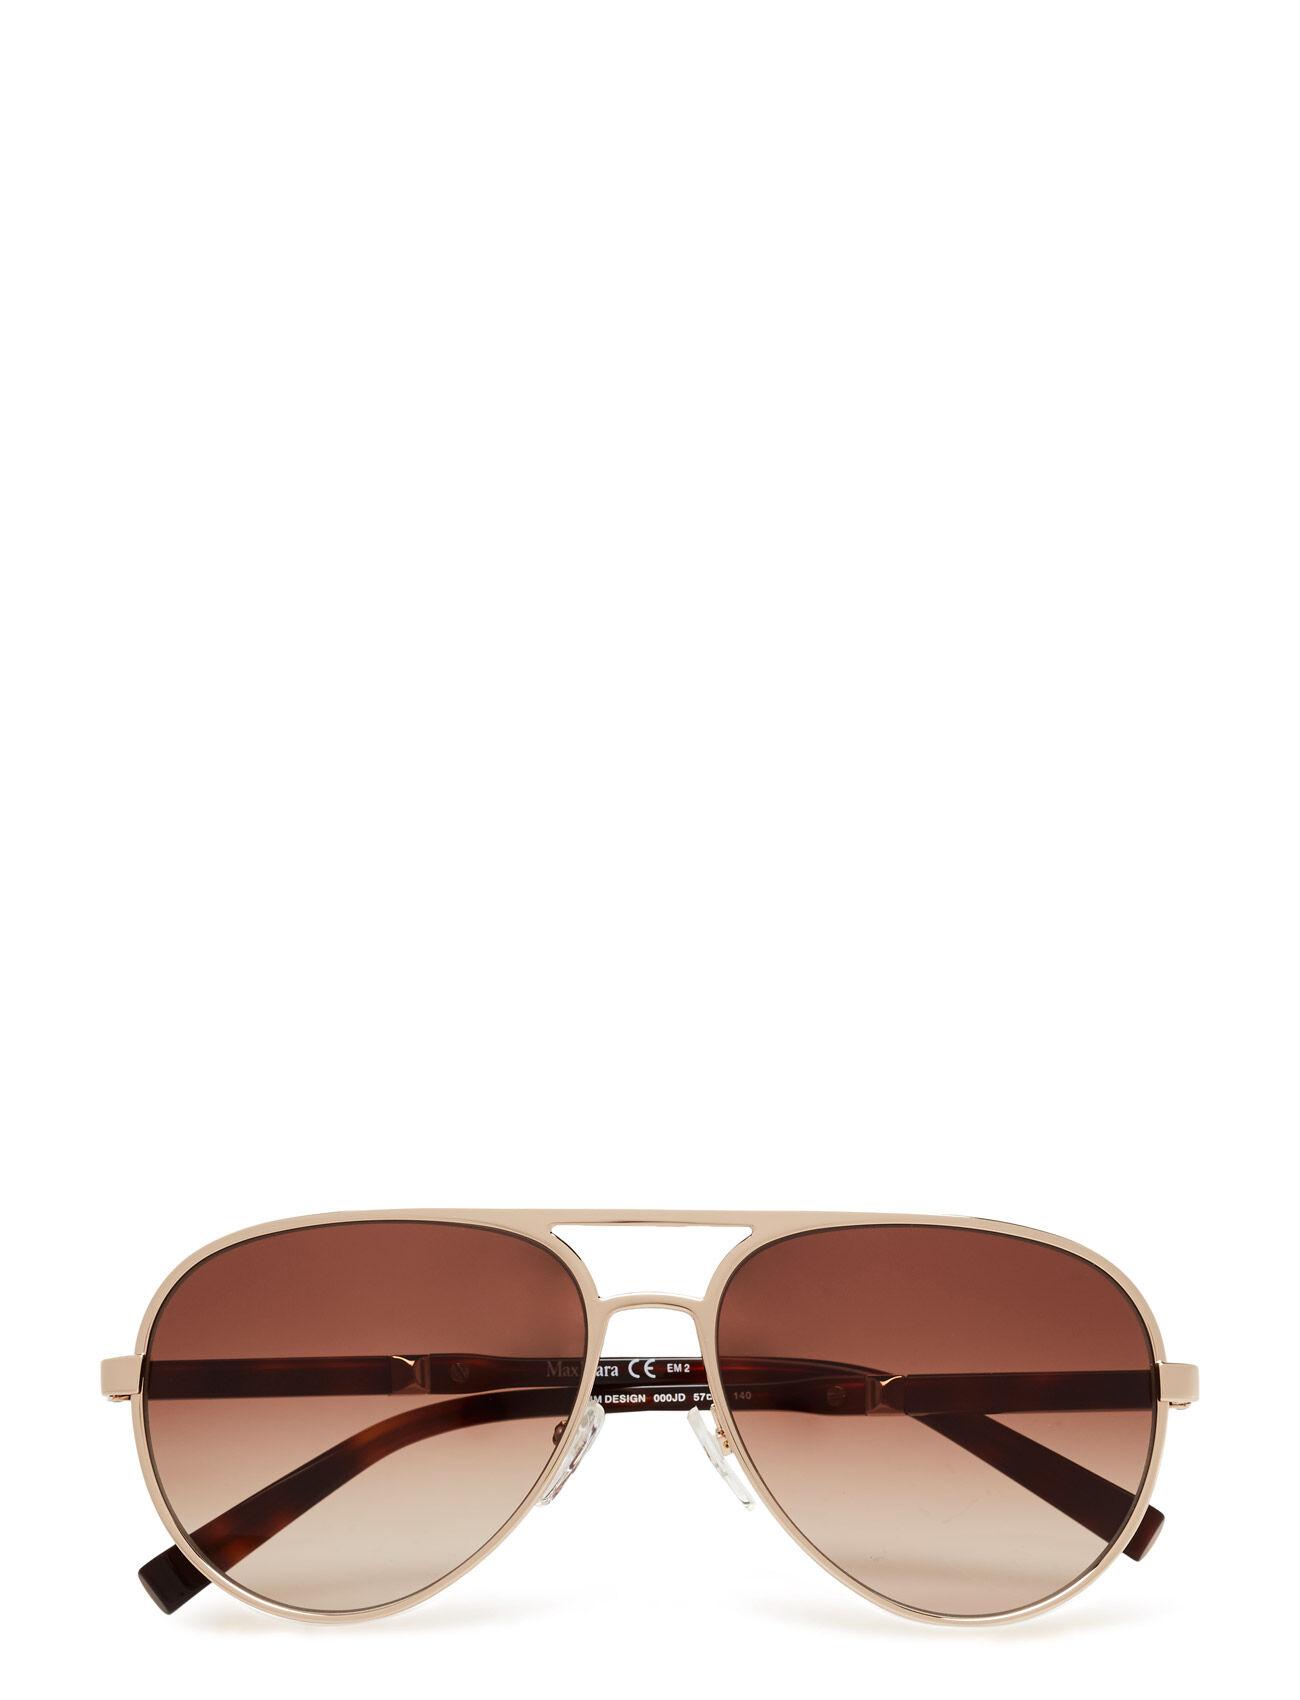 MAXMARA Sunglasses Mm Design